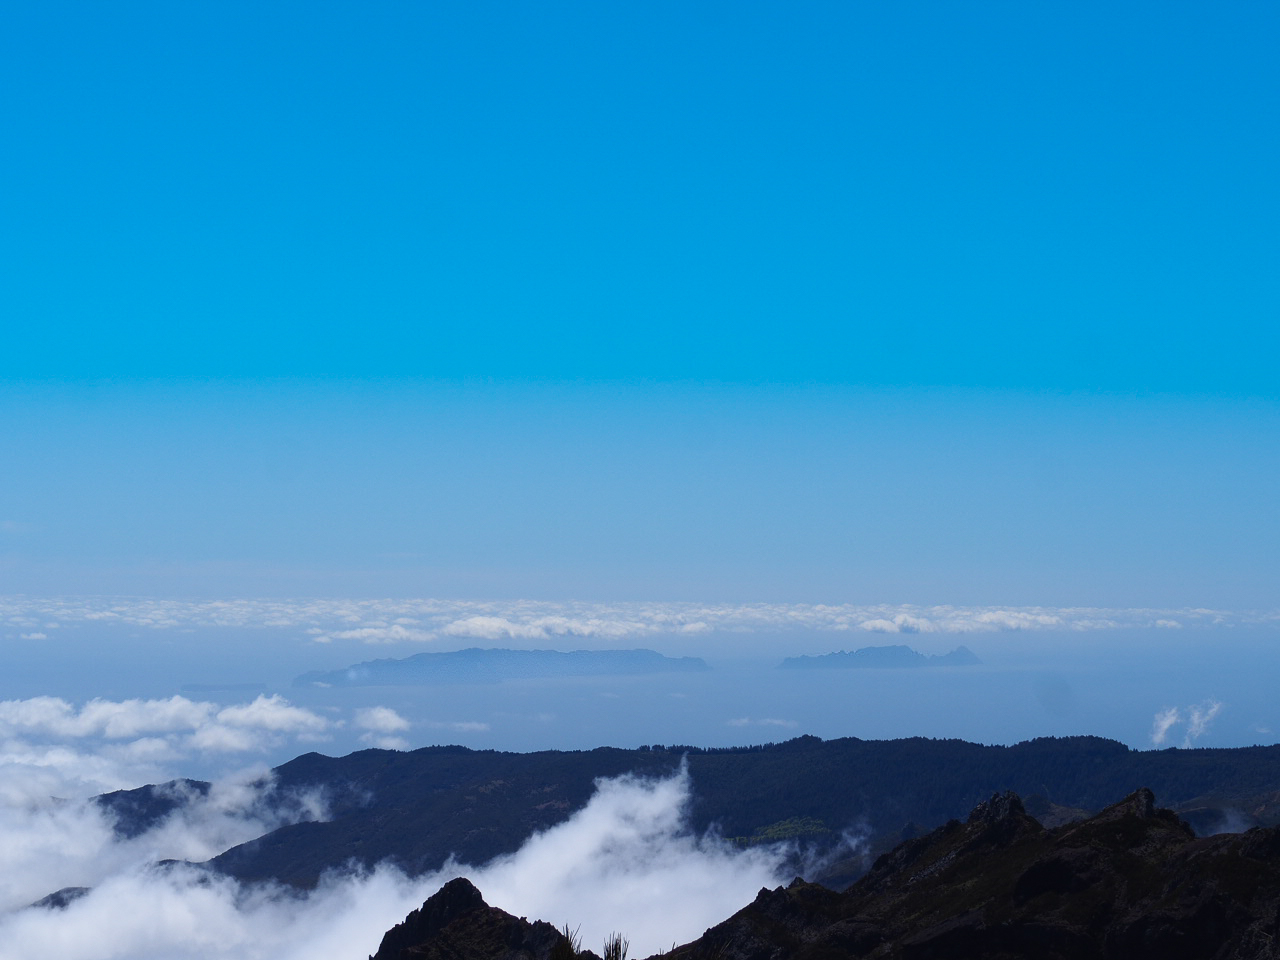 vue-sur-les-iles-desertes-randonnees-pico-ruivo-madere